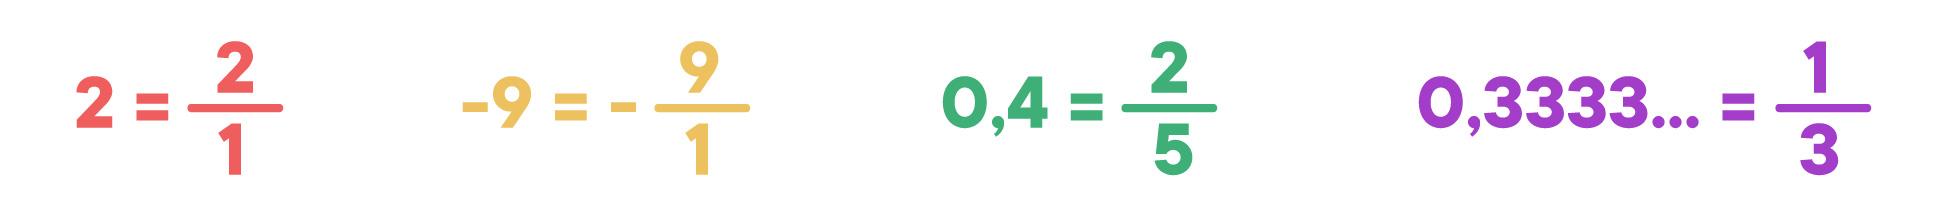 2 = 2/1; -9 = -9/1; 0,4 = 2/5; 0,3333... = 1/3